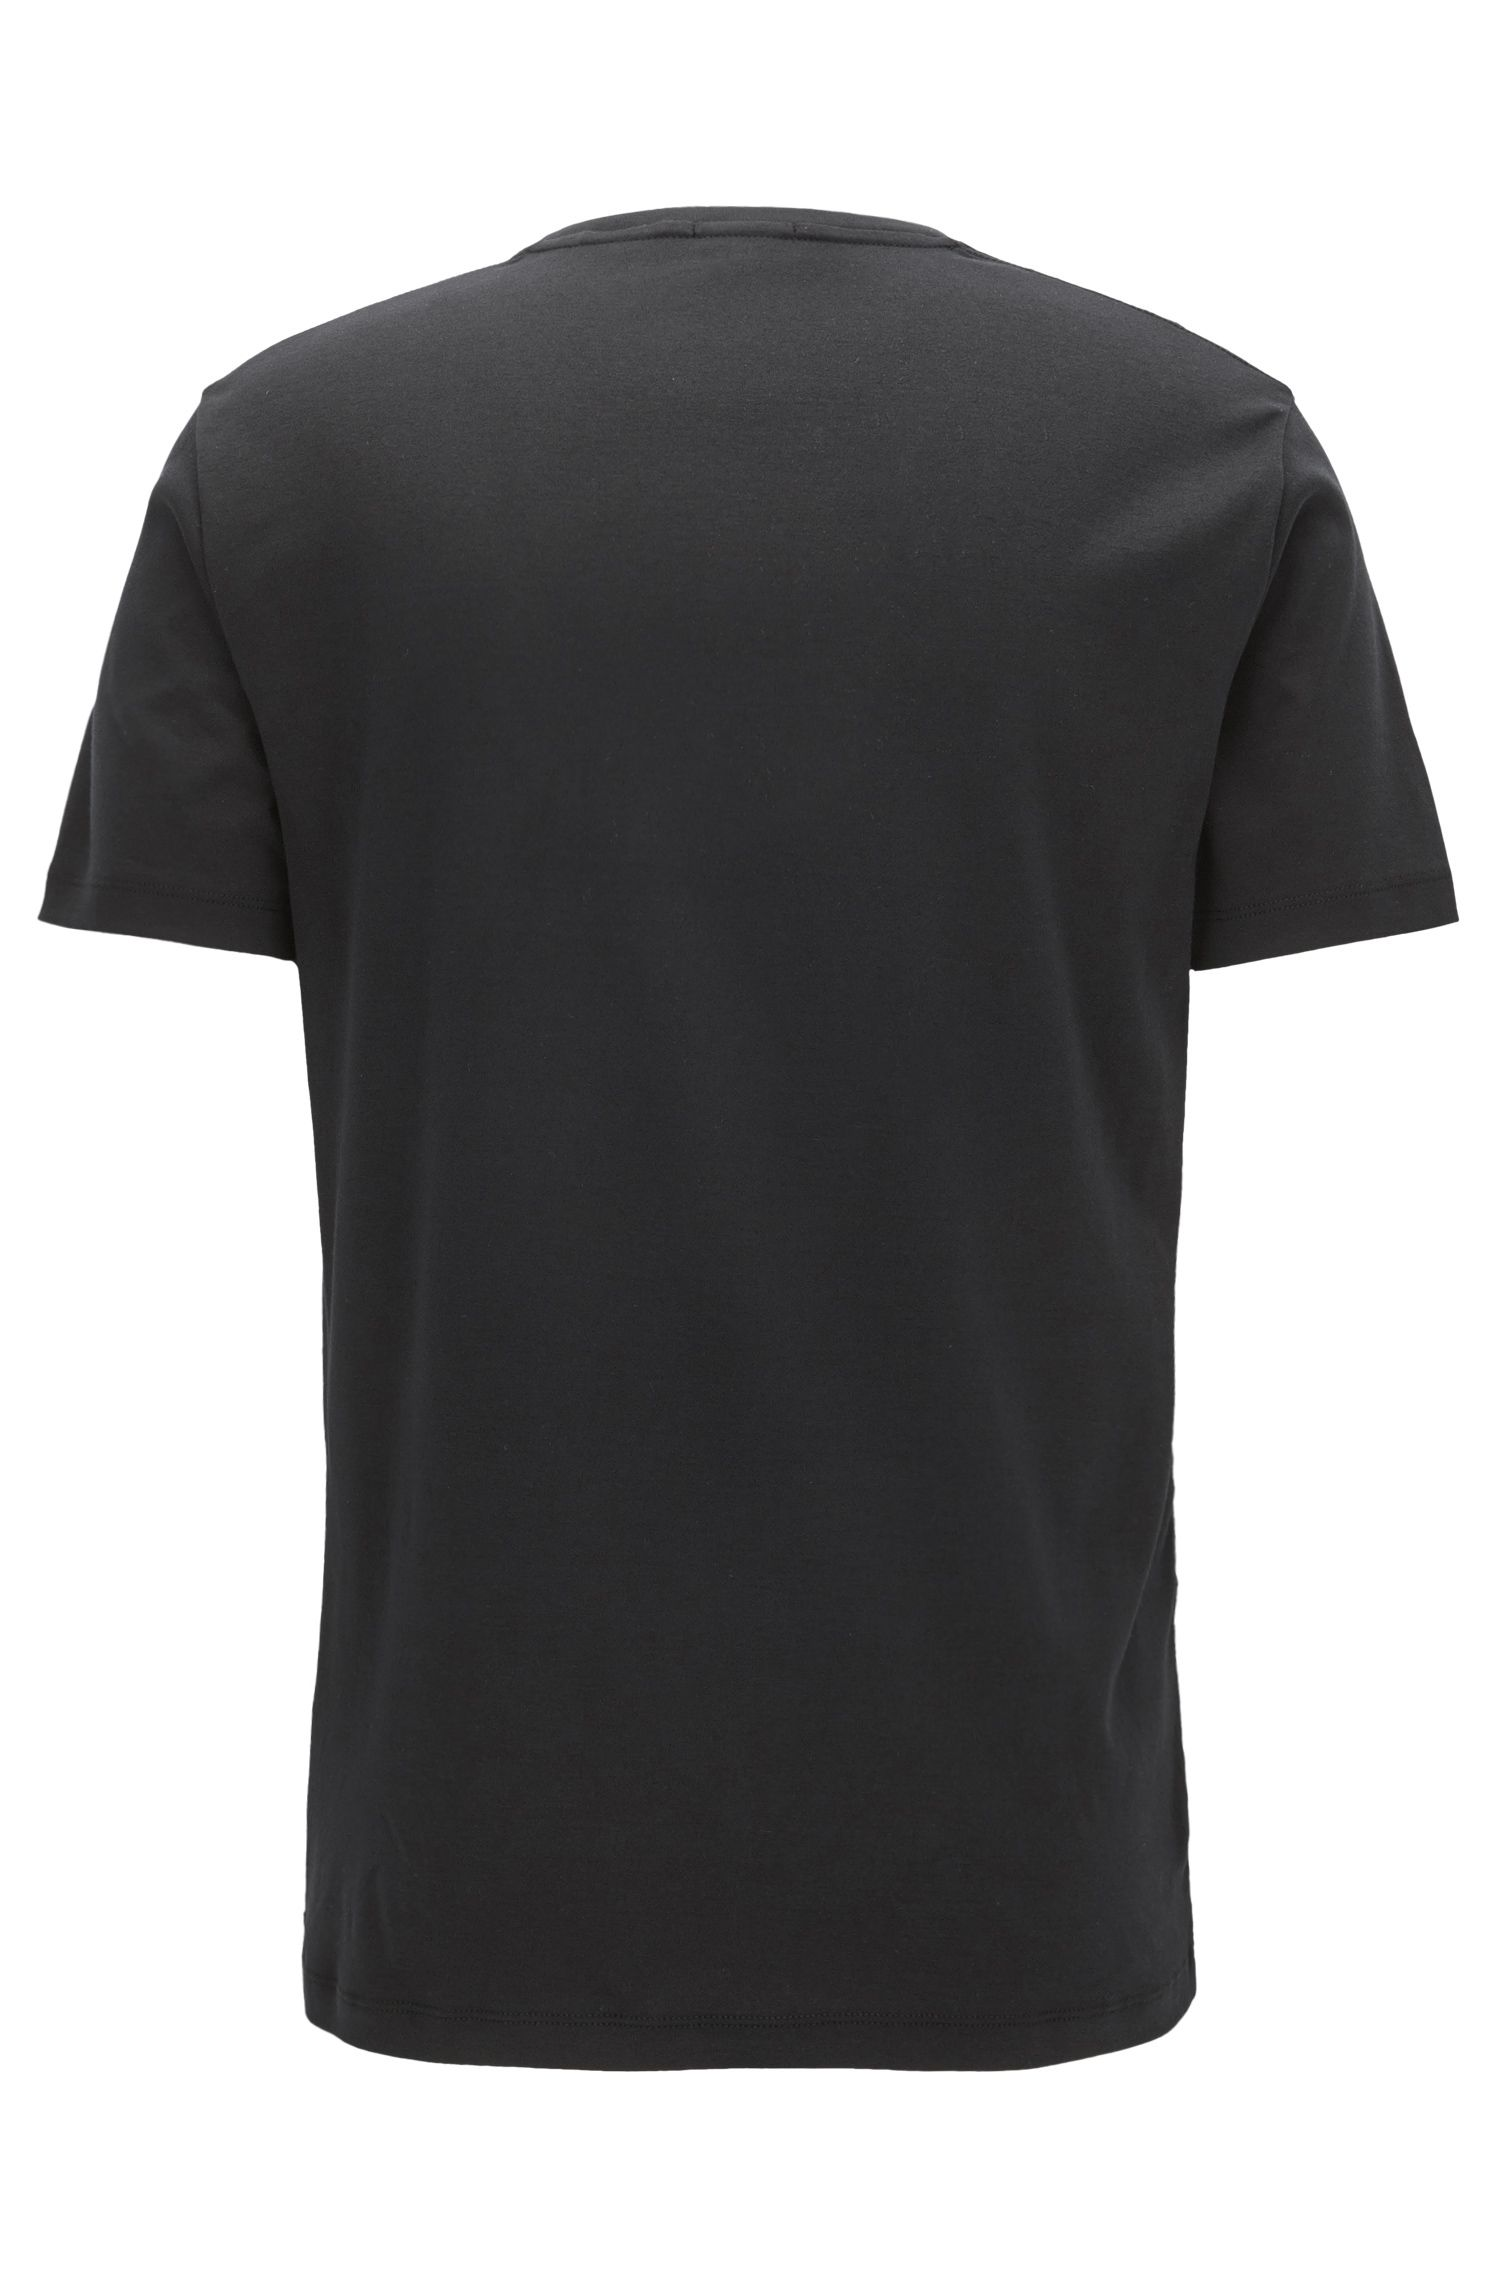 Paisley Jacquard T-Shirt | Tessler